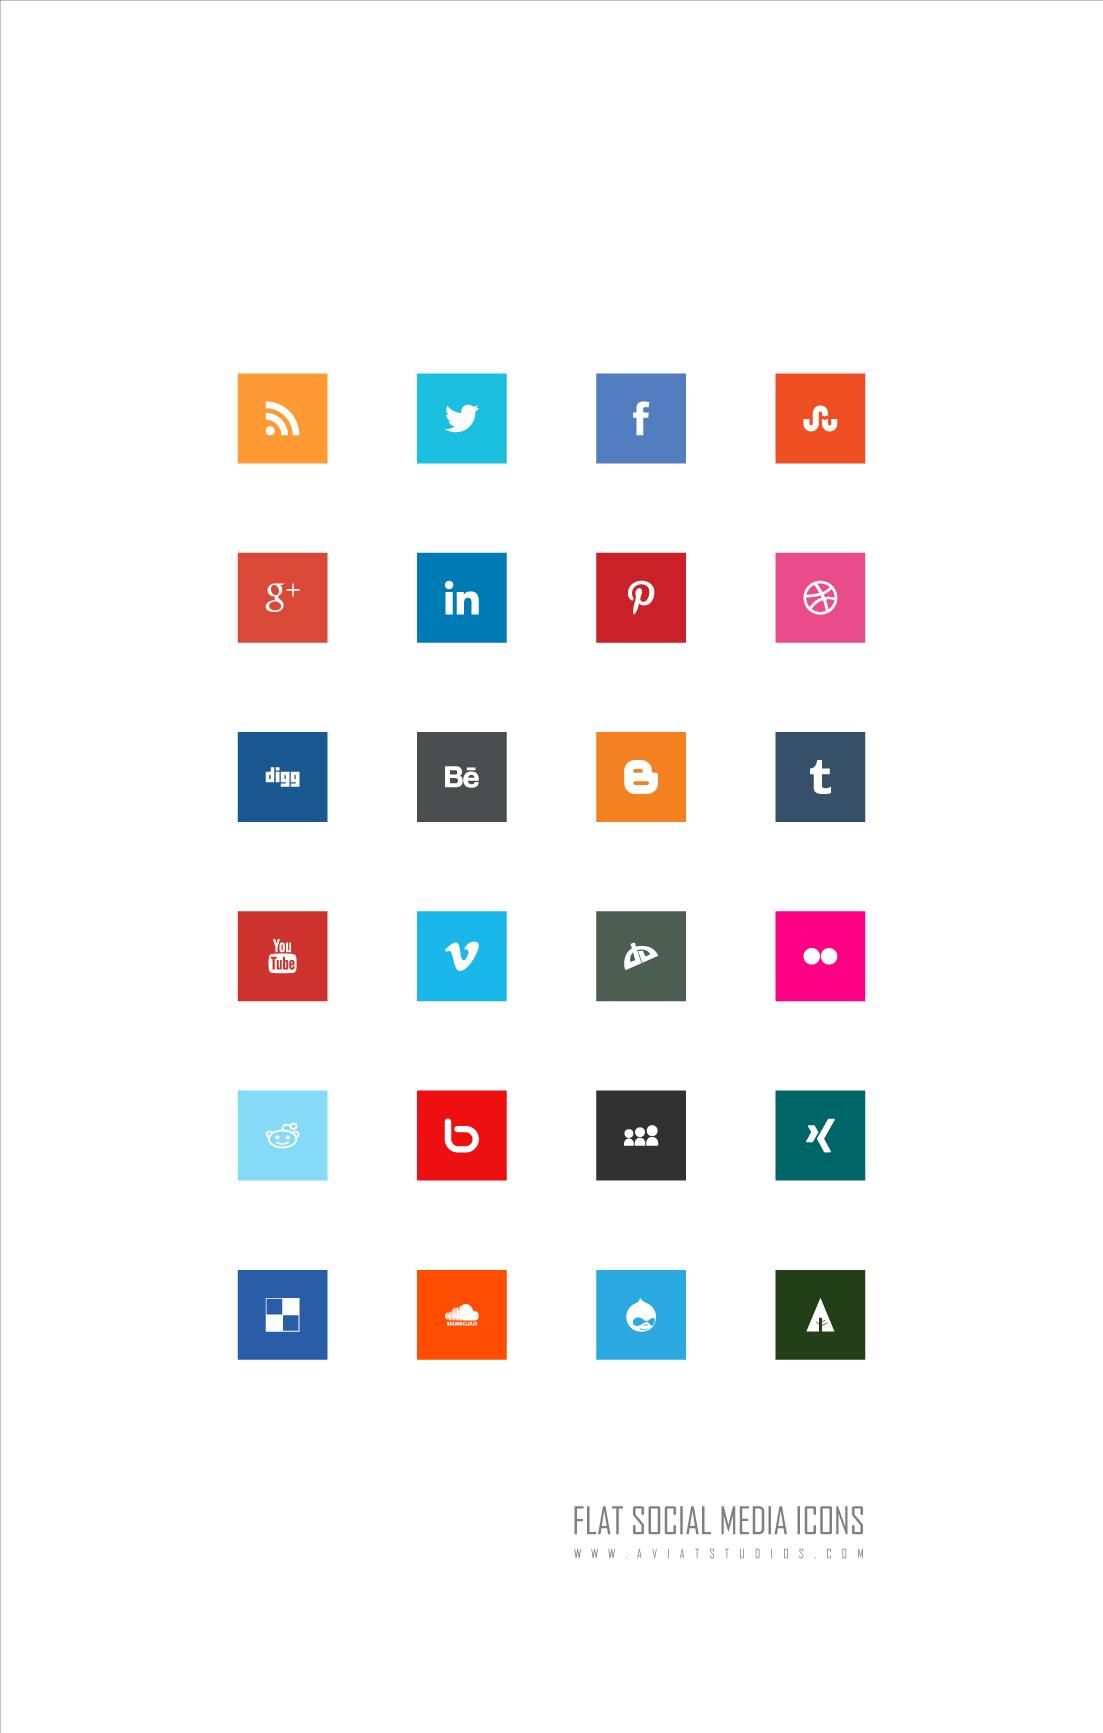 Free Flat Social Media Icons